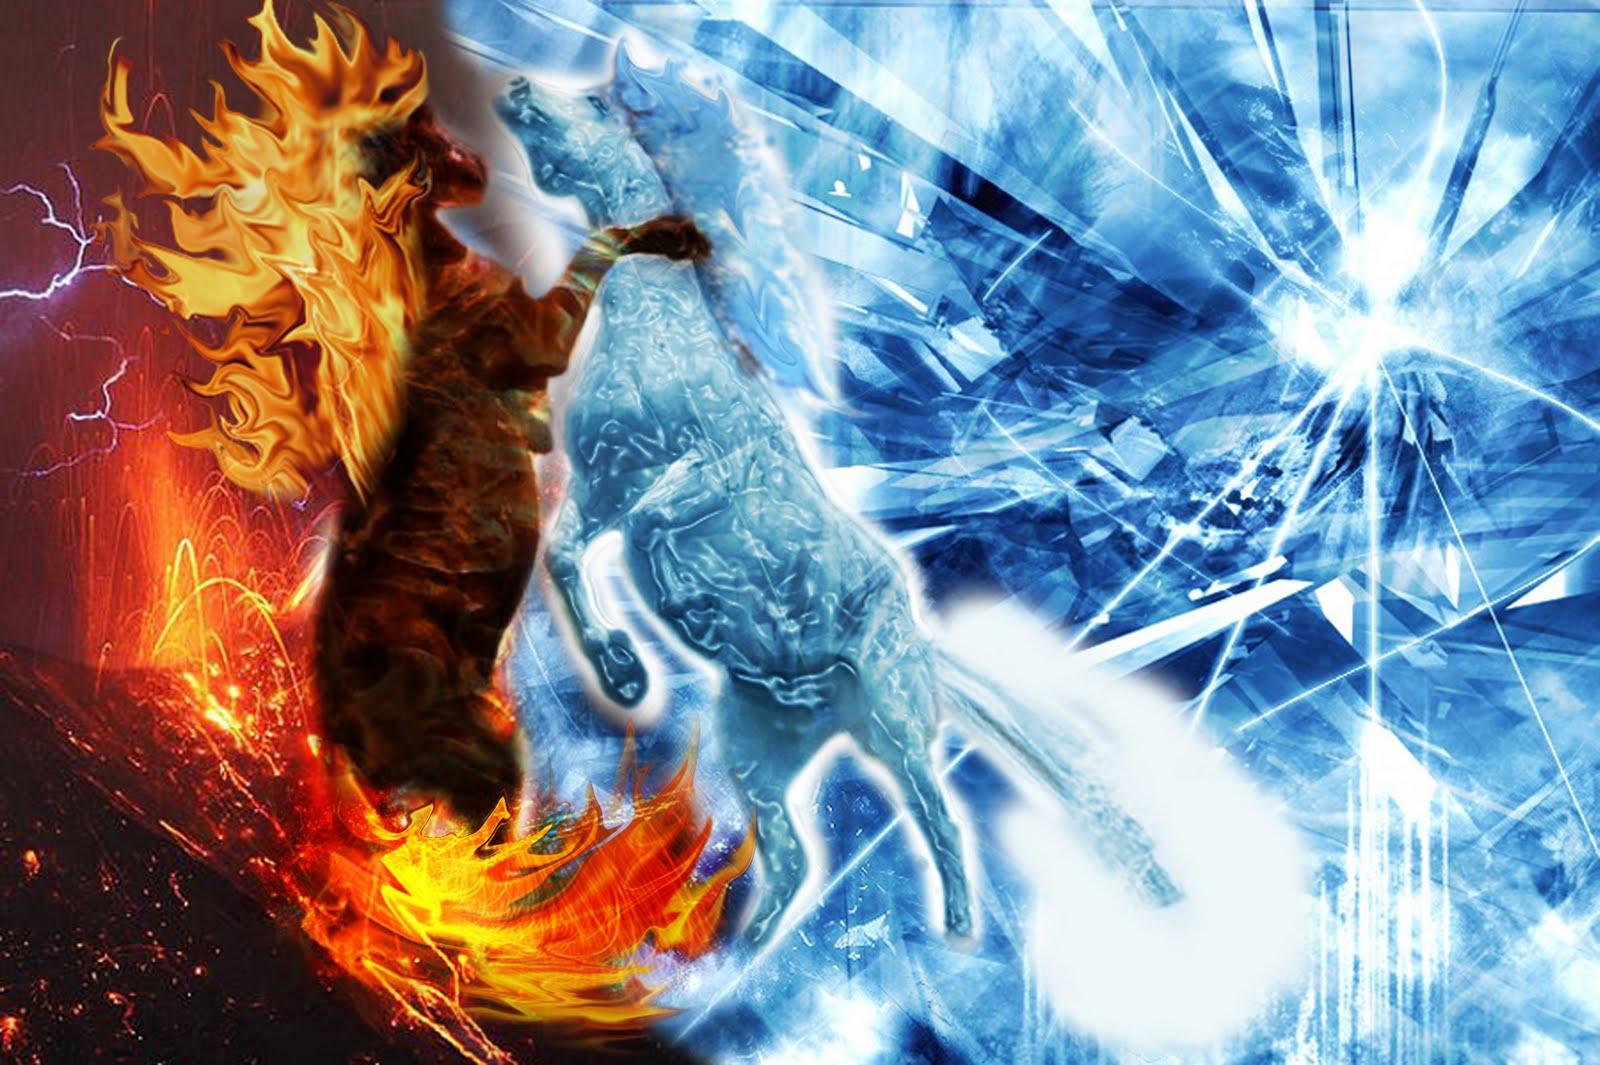 Avatar Aang Wallpaper Hd Nem Todo Bloco De Gelo Derrete Com Fogo Voc 234 Vaientender